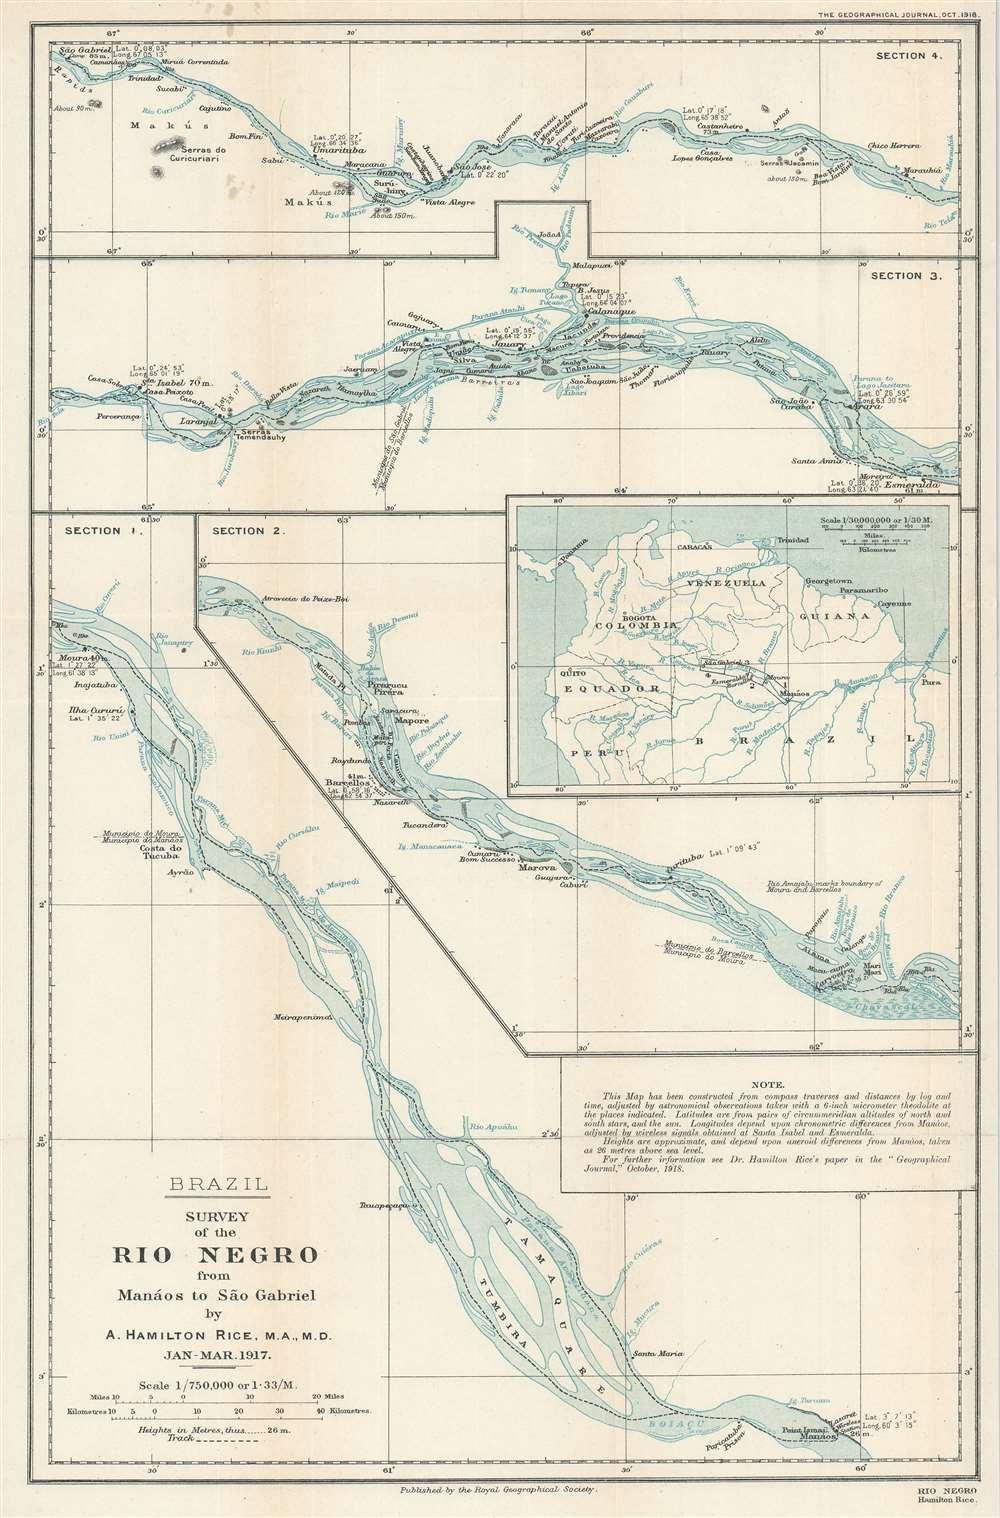 1918 Rice Map of the Rio Negro, Brazil